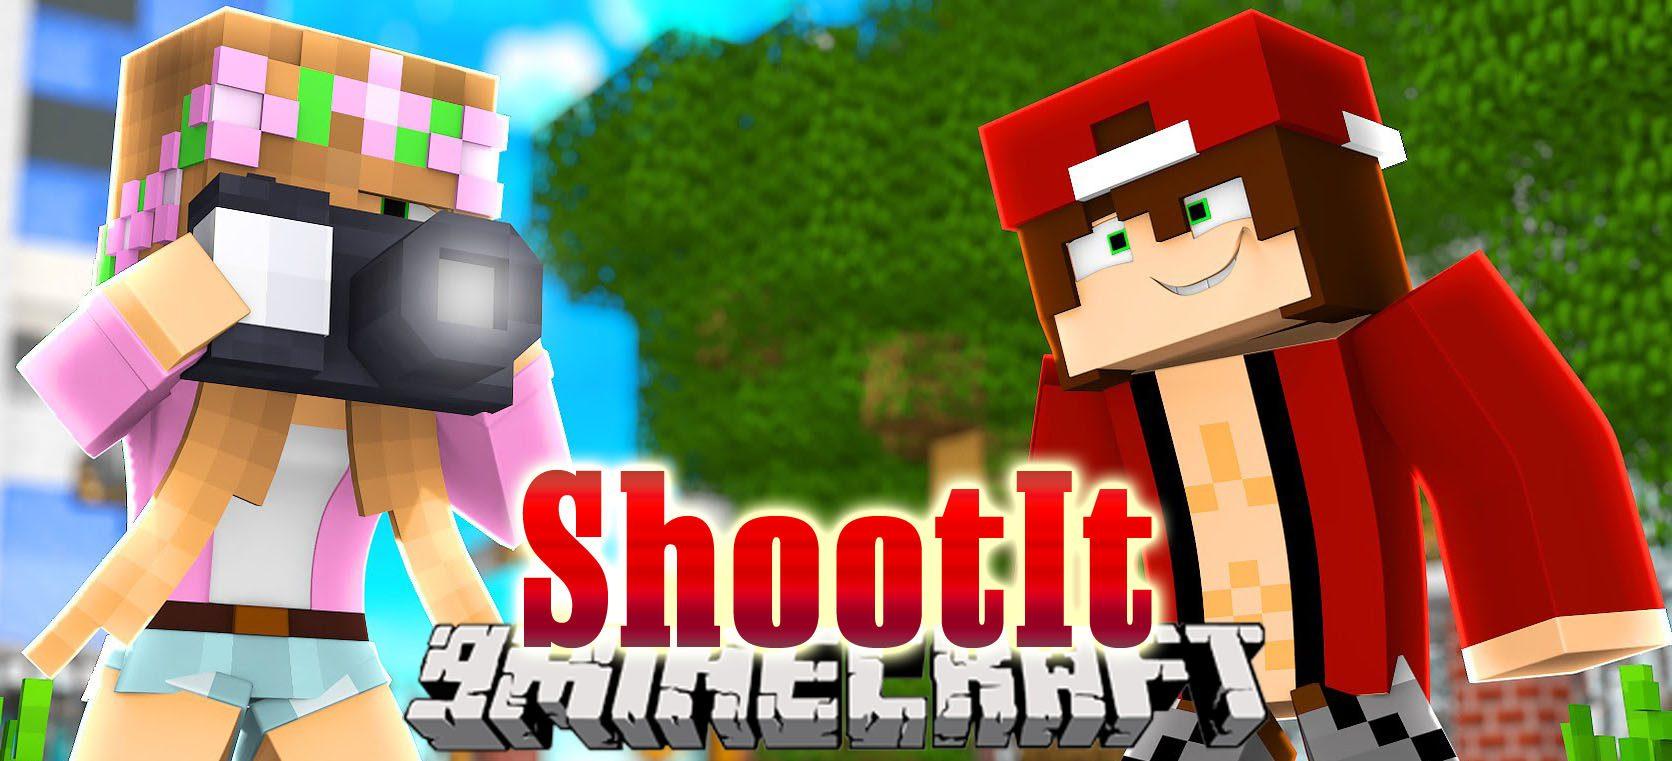 ShootIt Mod